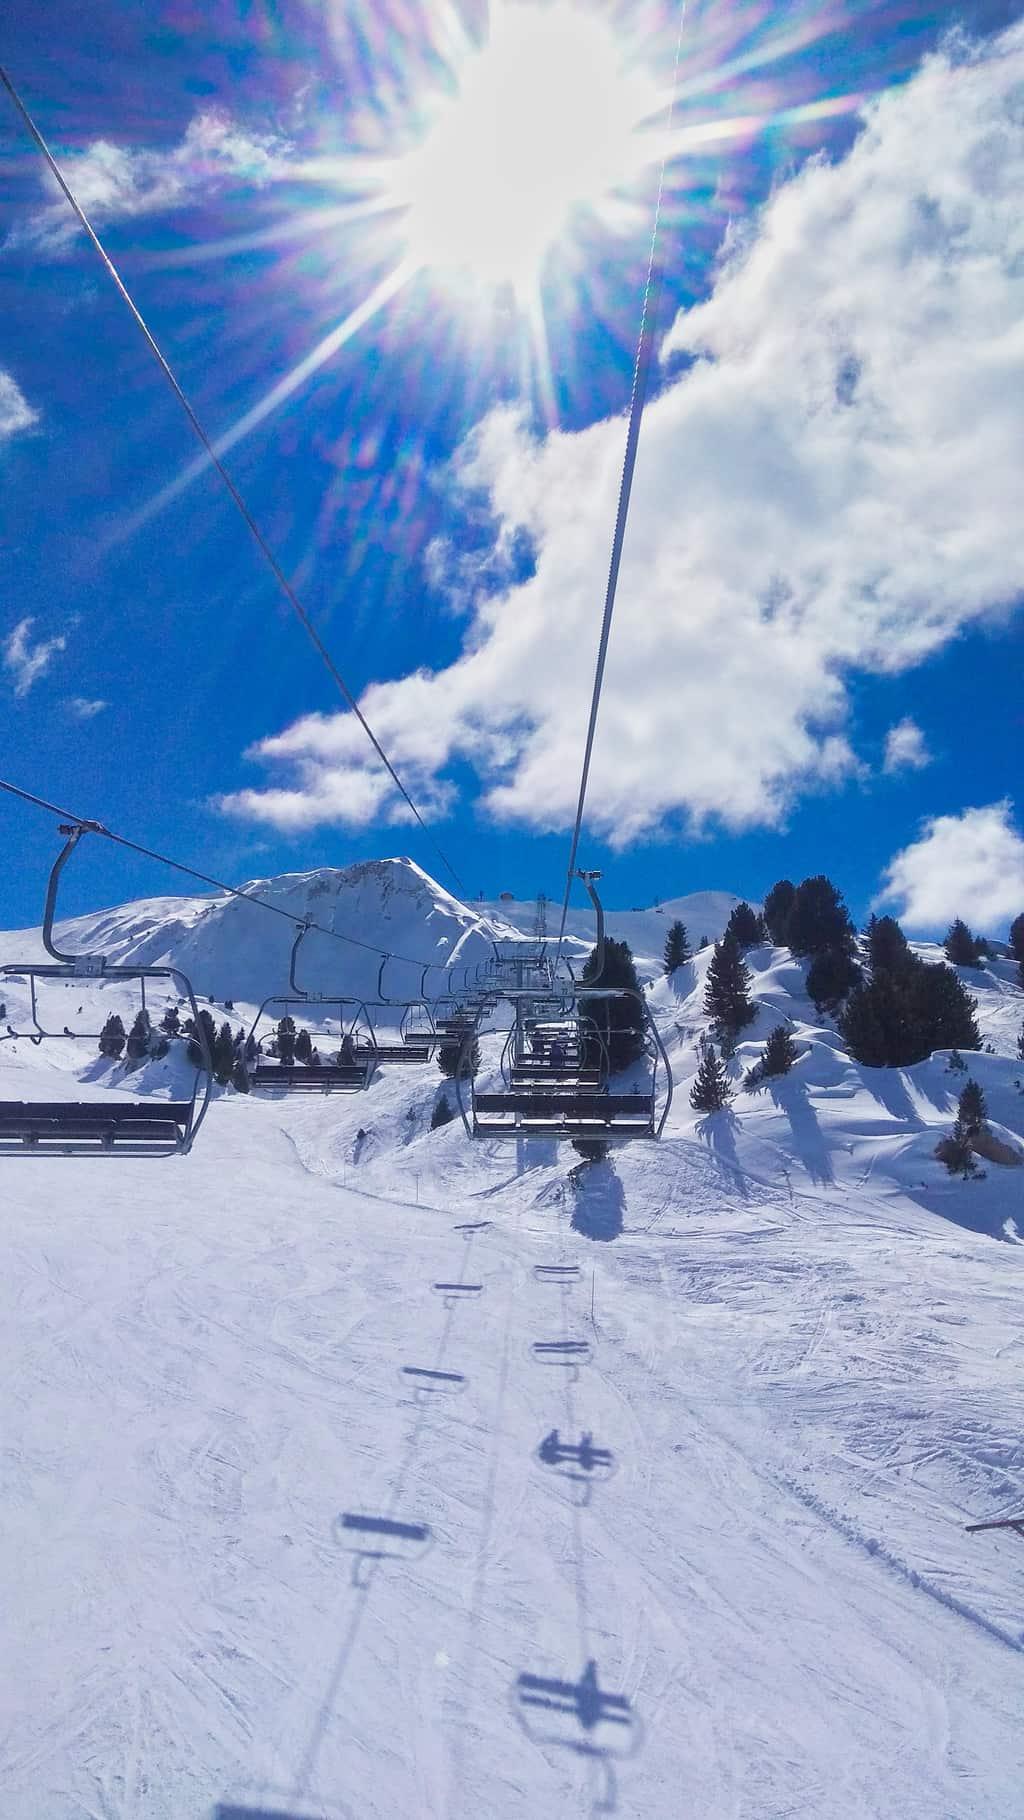 Chairlift going up ski slope Les Arcs